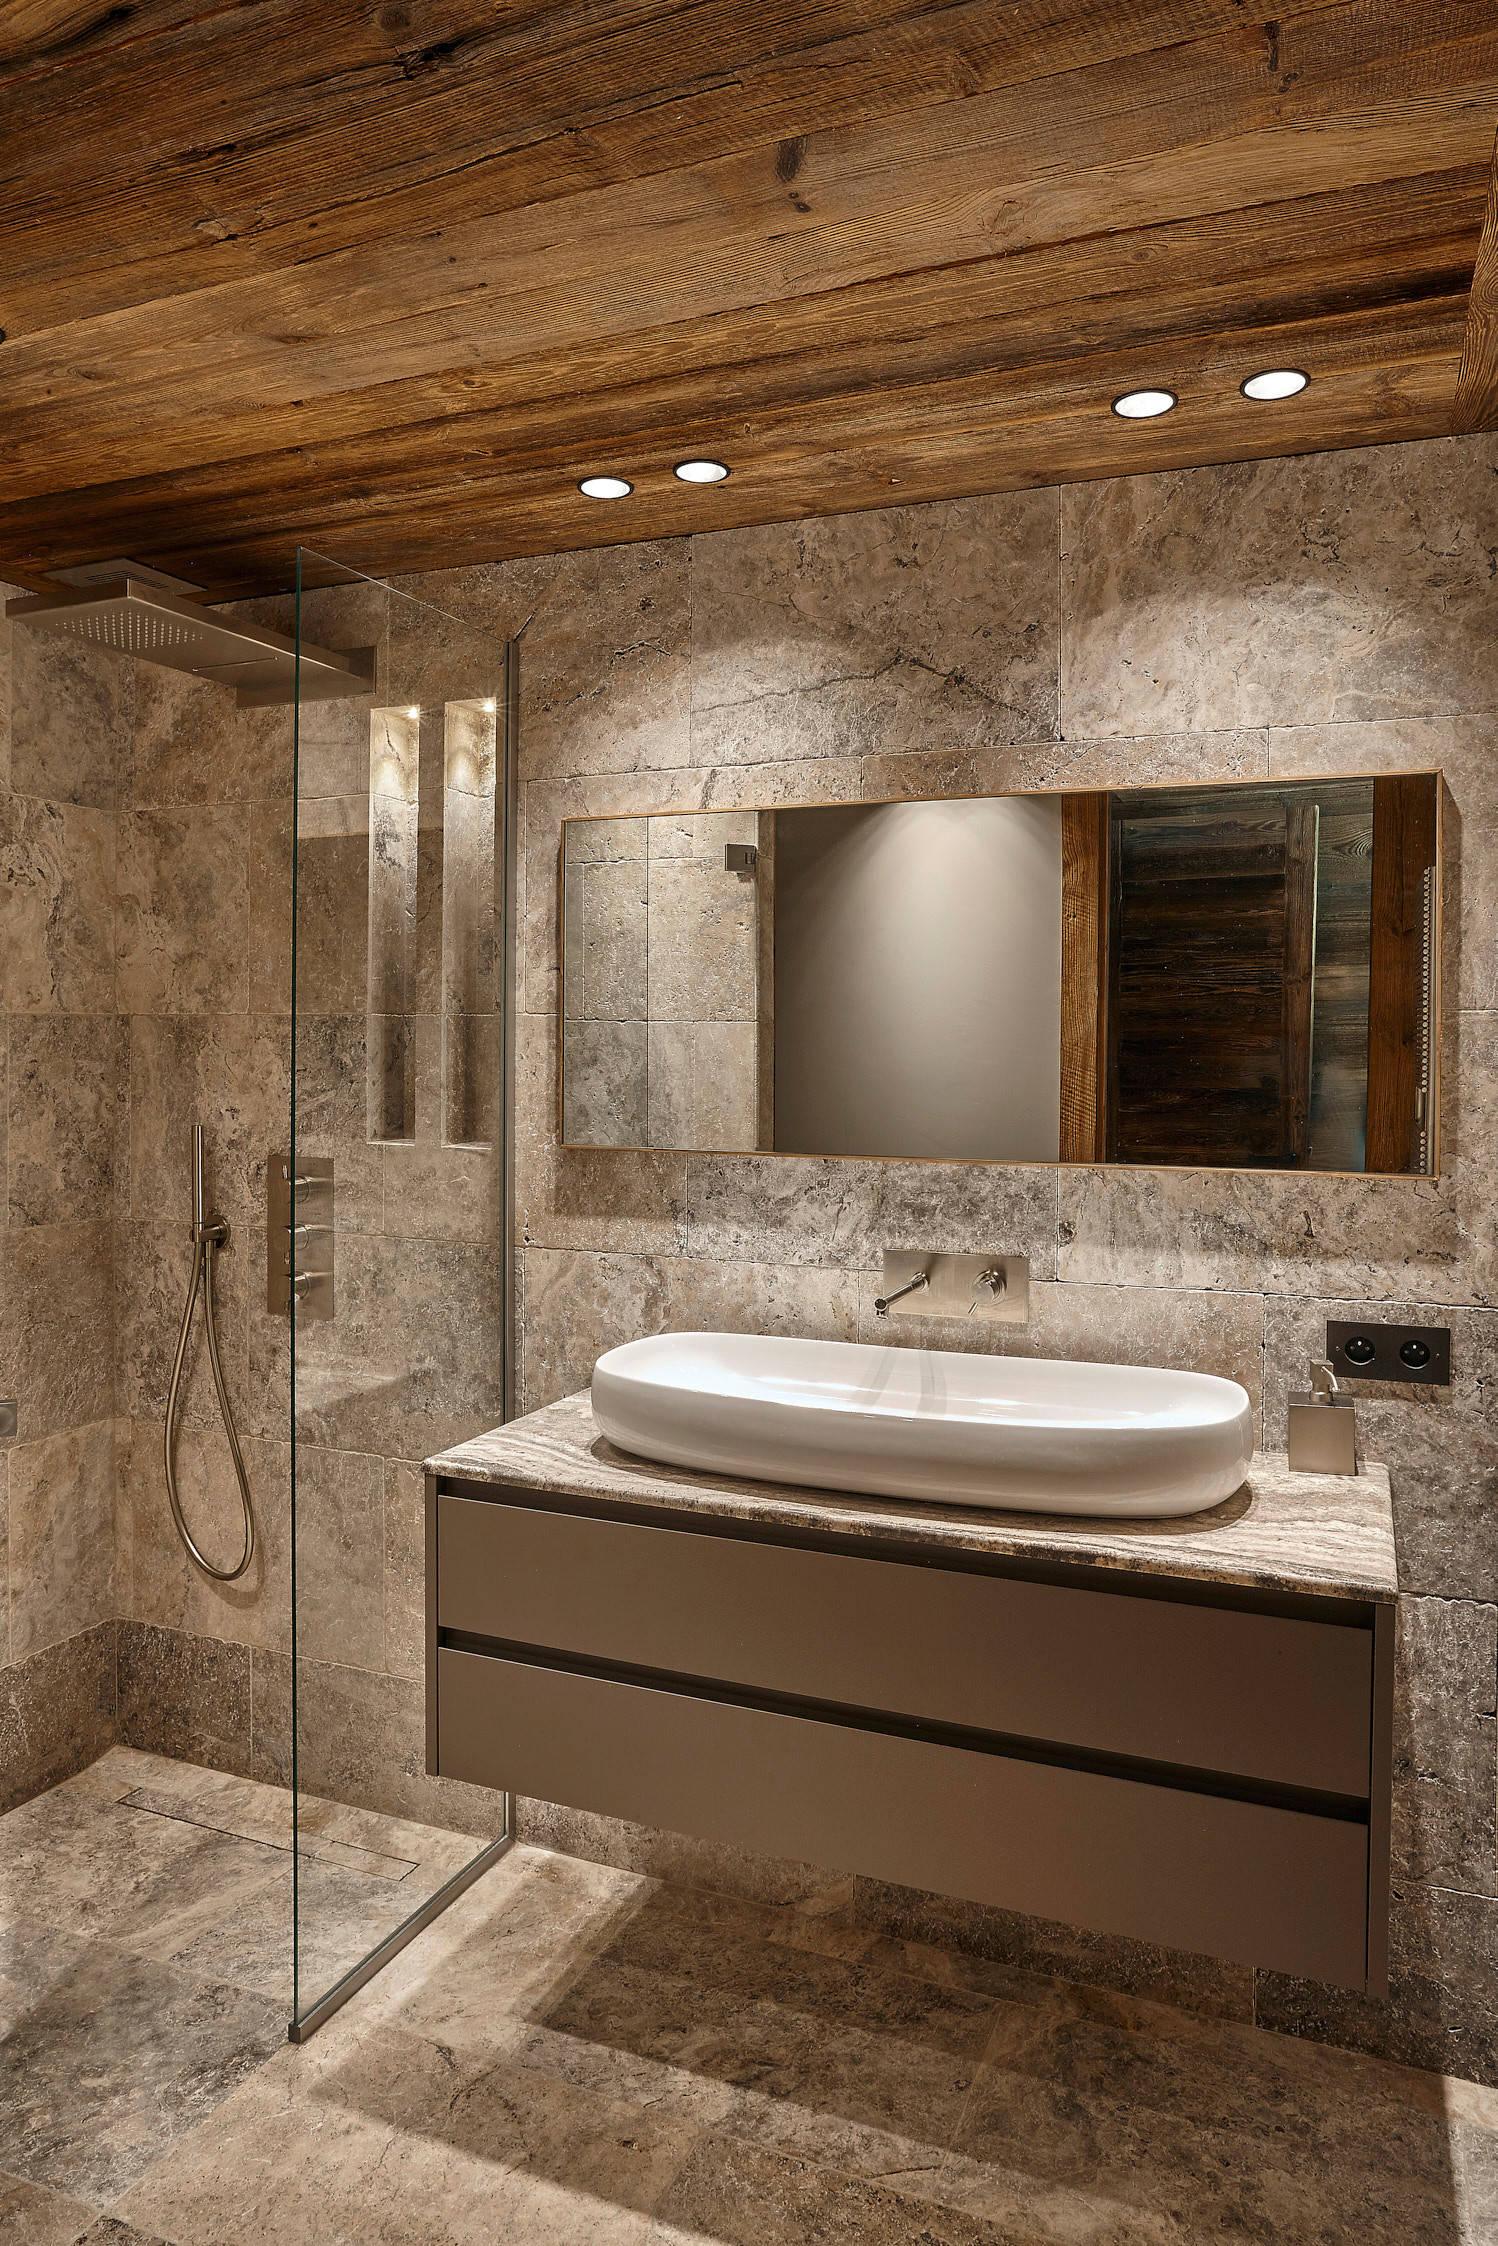 16 fantastic rustic bathroom designs that will take your on rustic bathroom designs photos id=85996